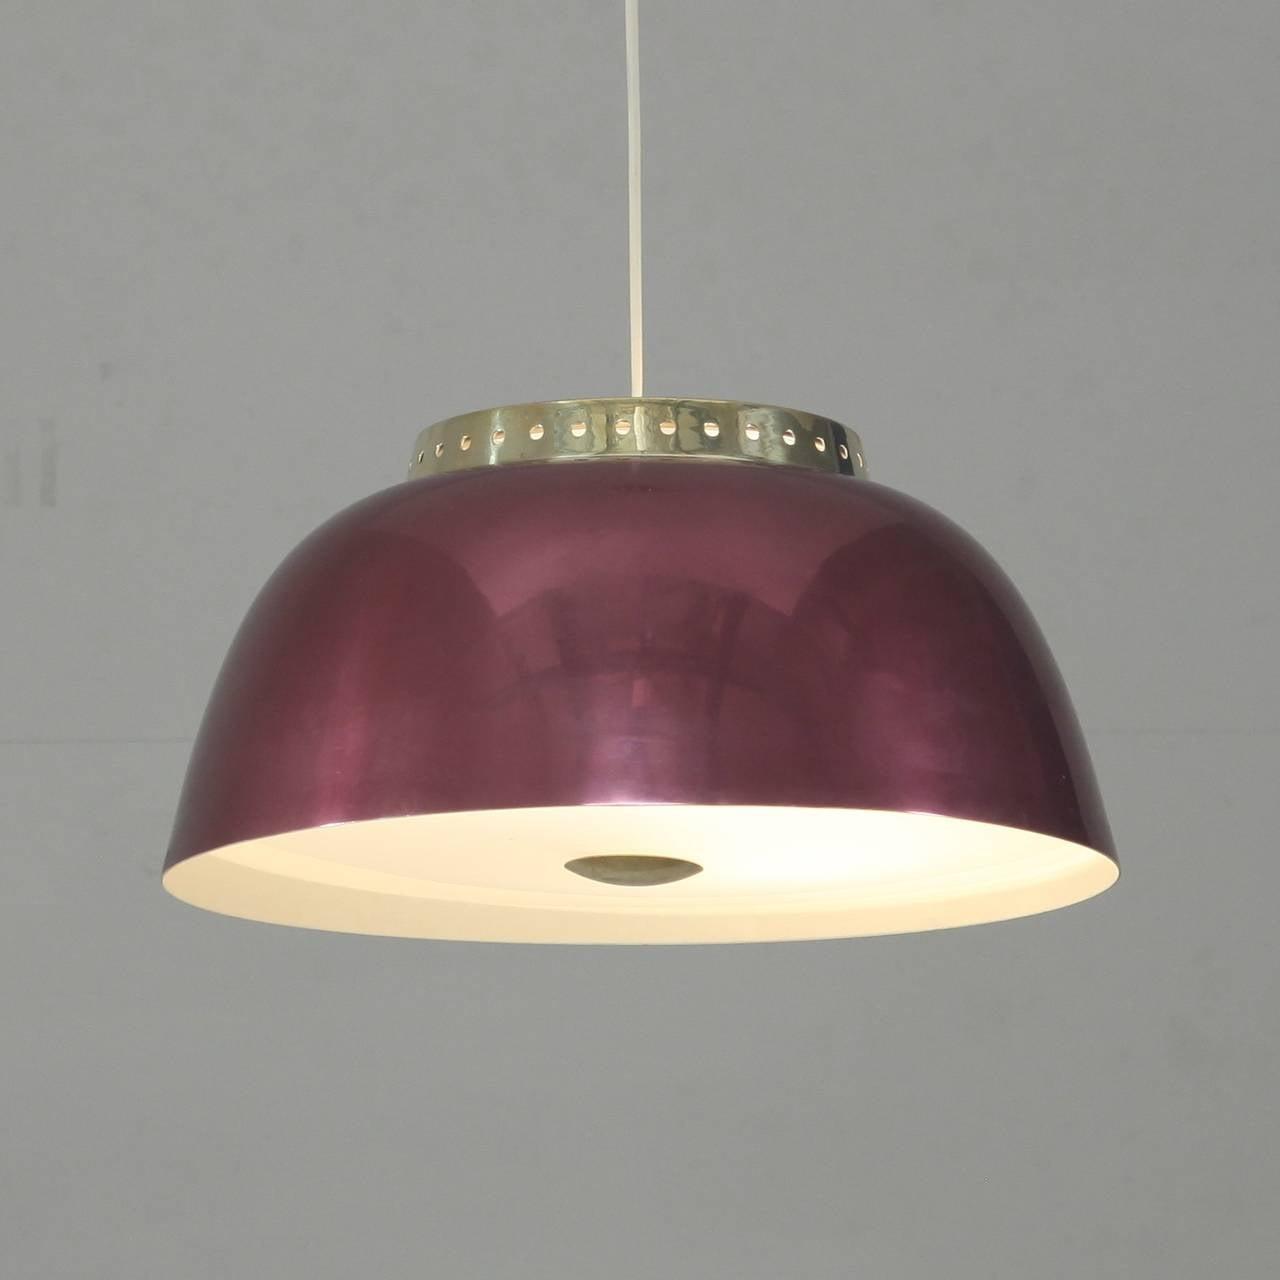 Scandinavian Modern Lisa Johansson-Pape Burgundy Pendant Lamp, Orno, Finland, 1950s